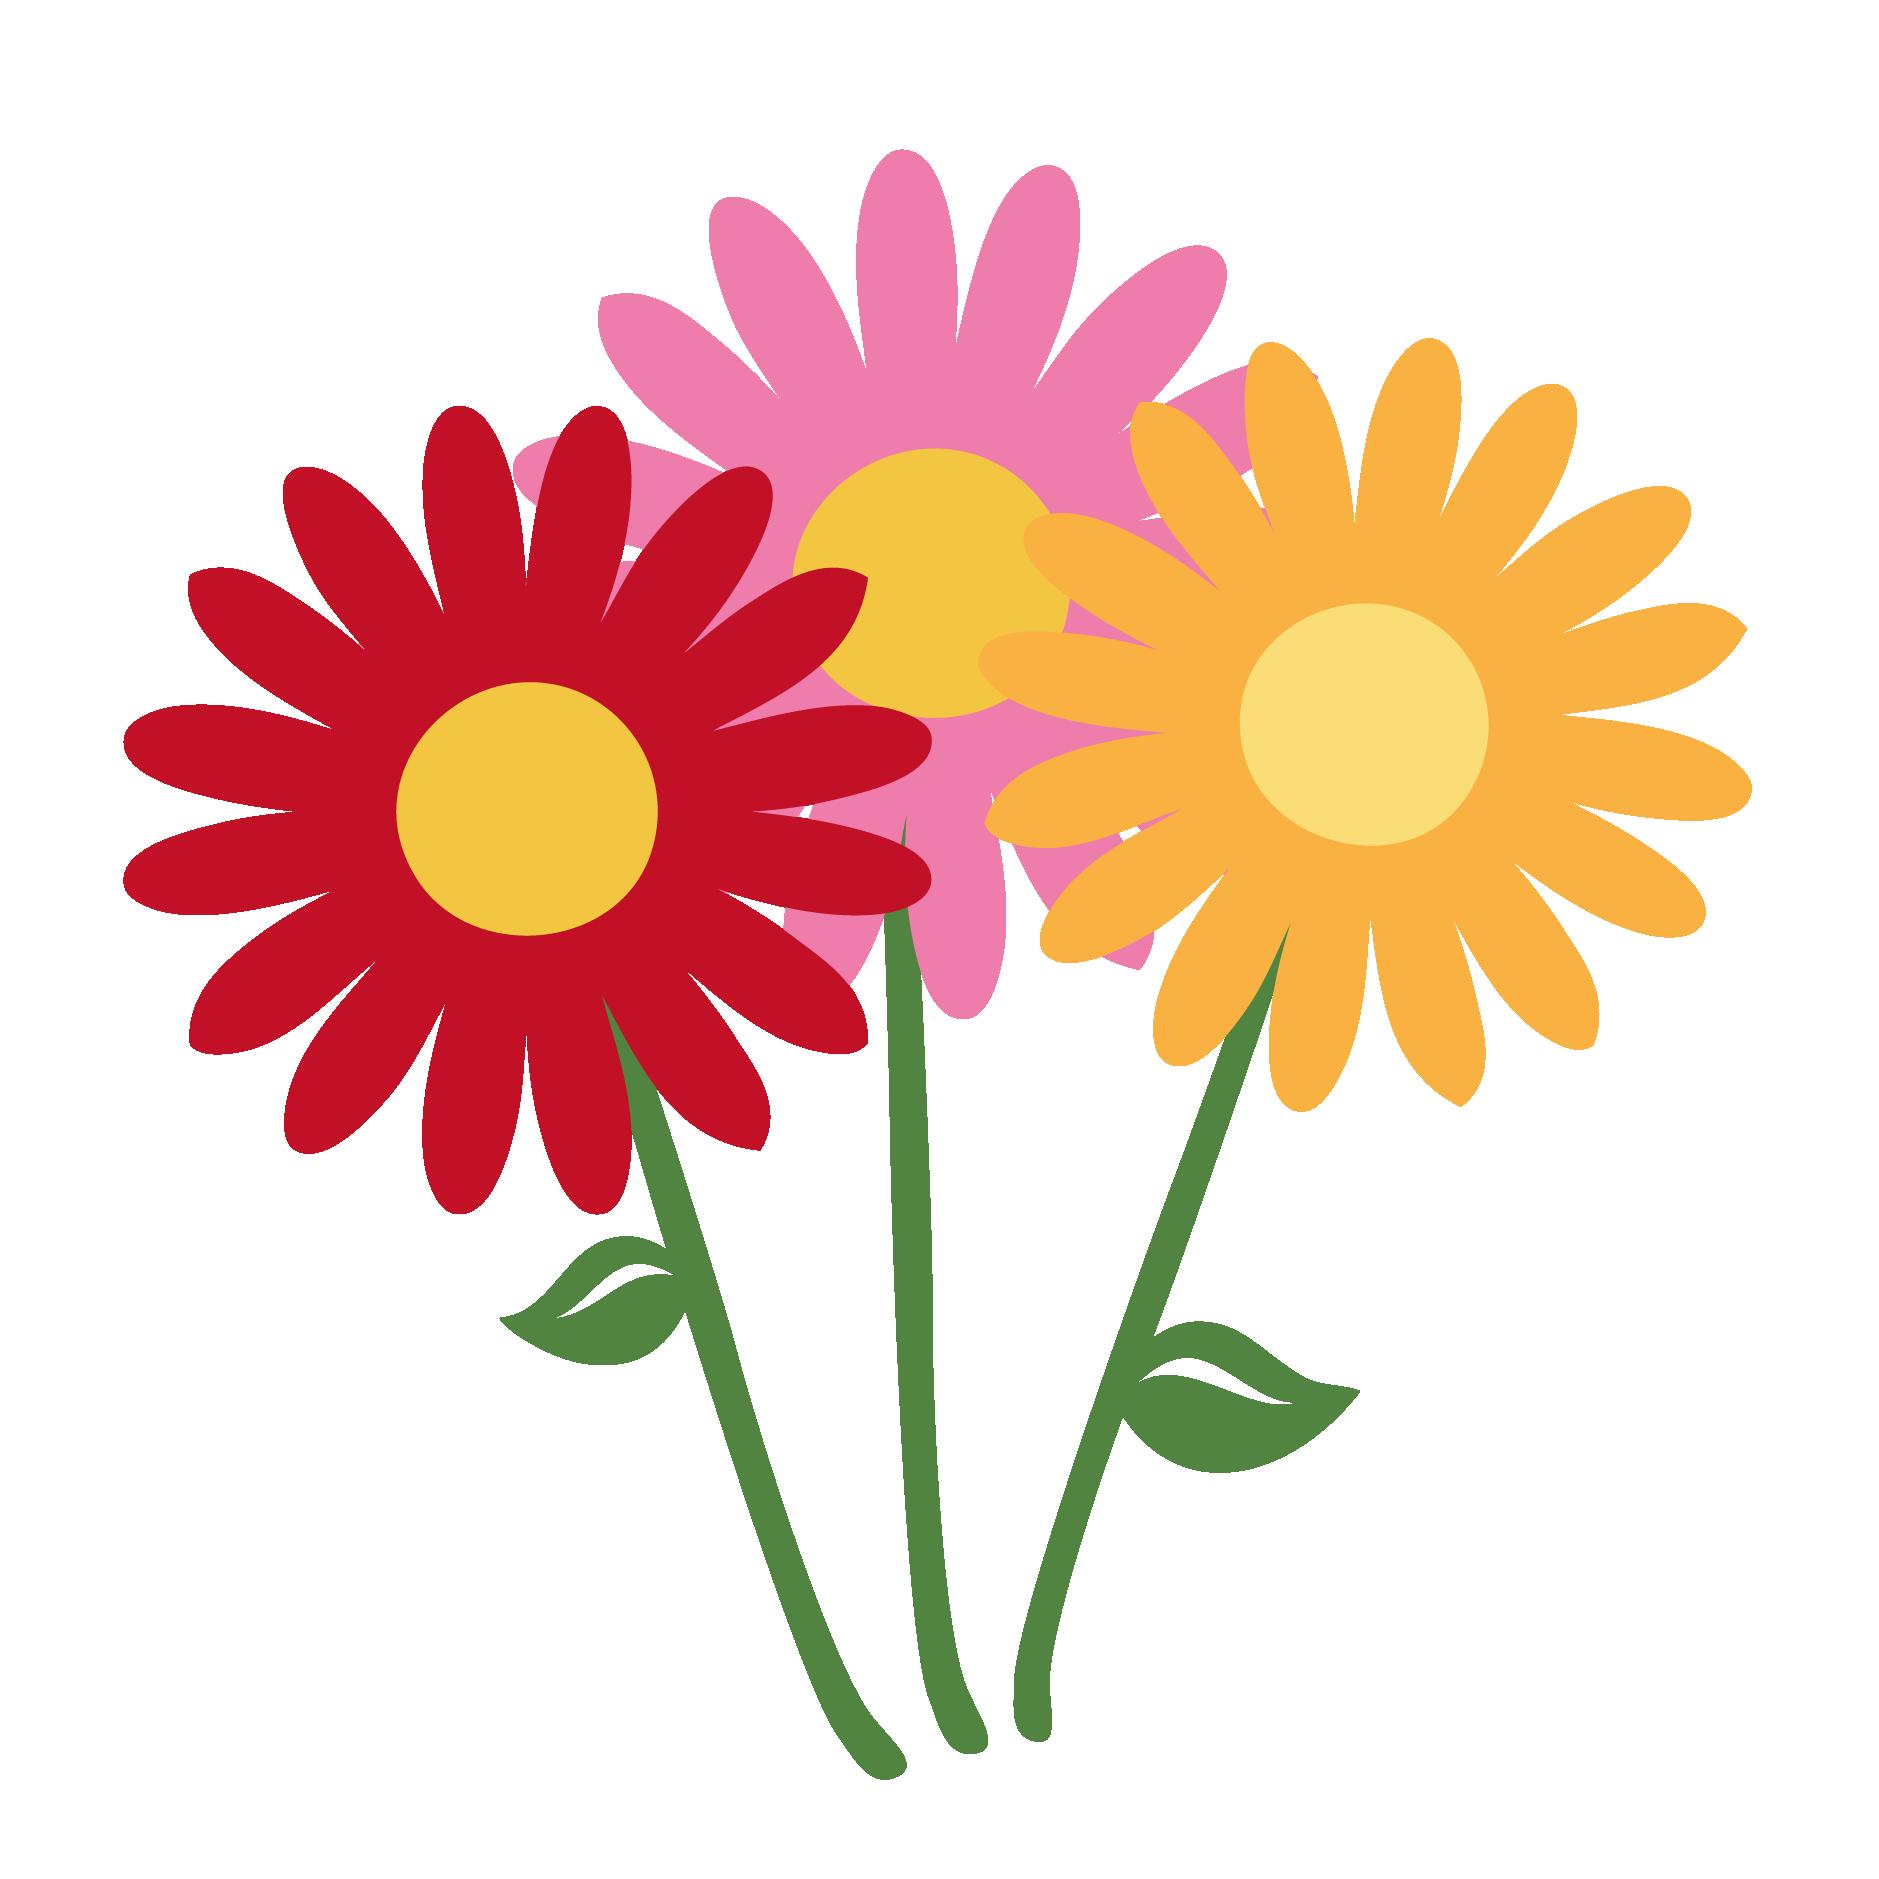 Fleurs_01.png